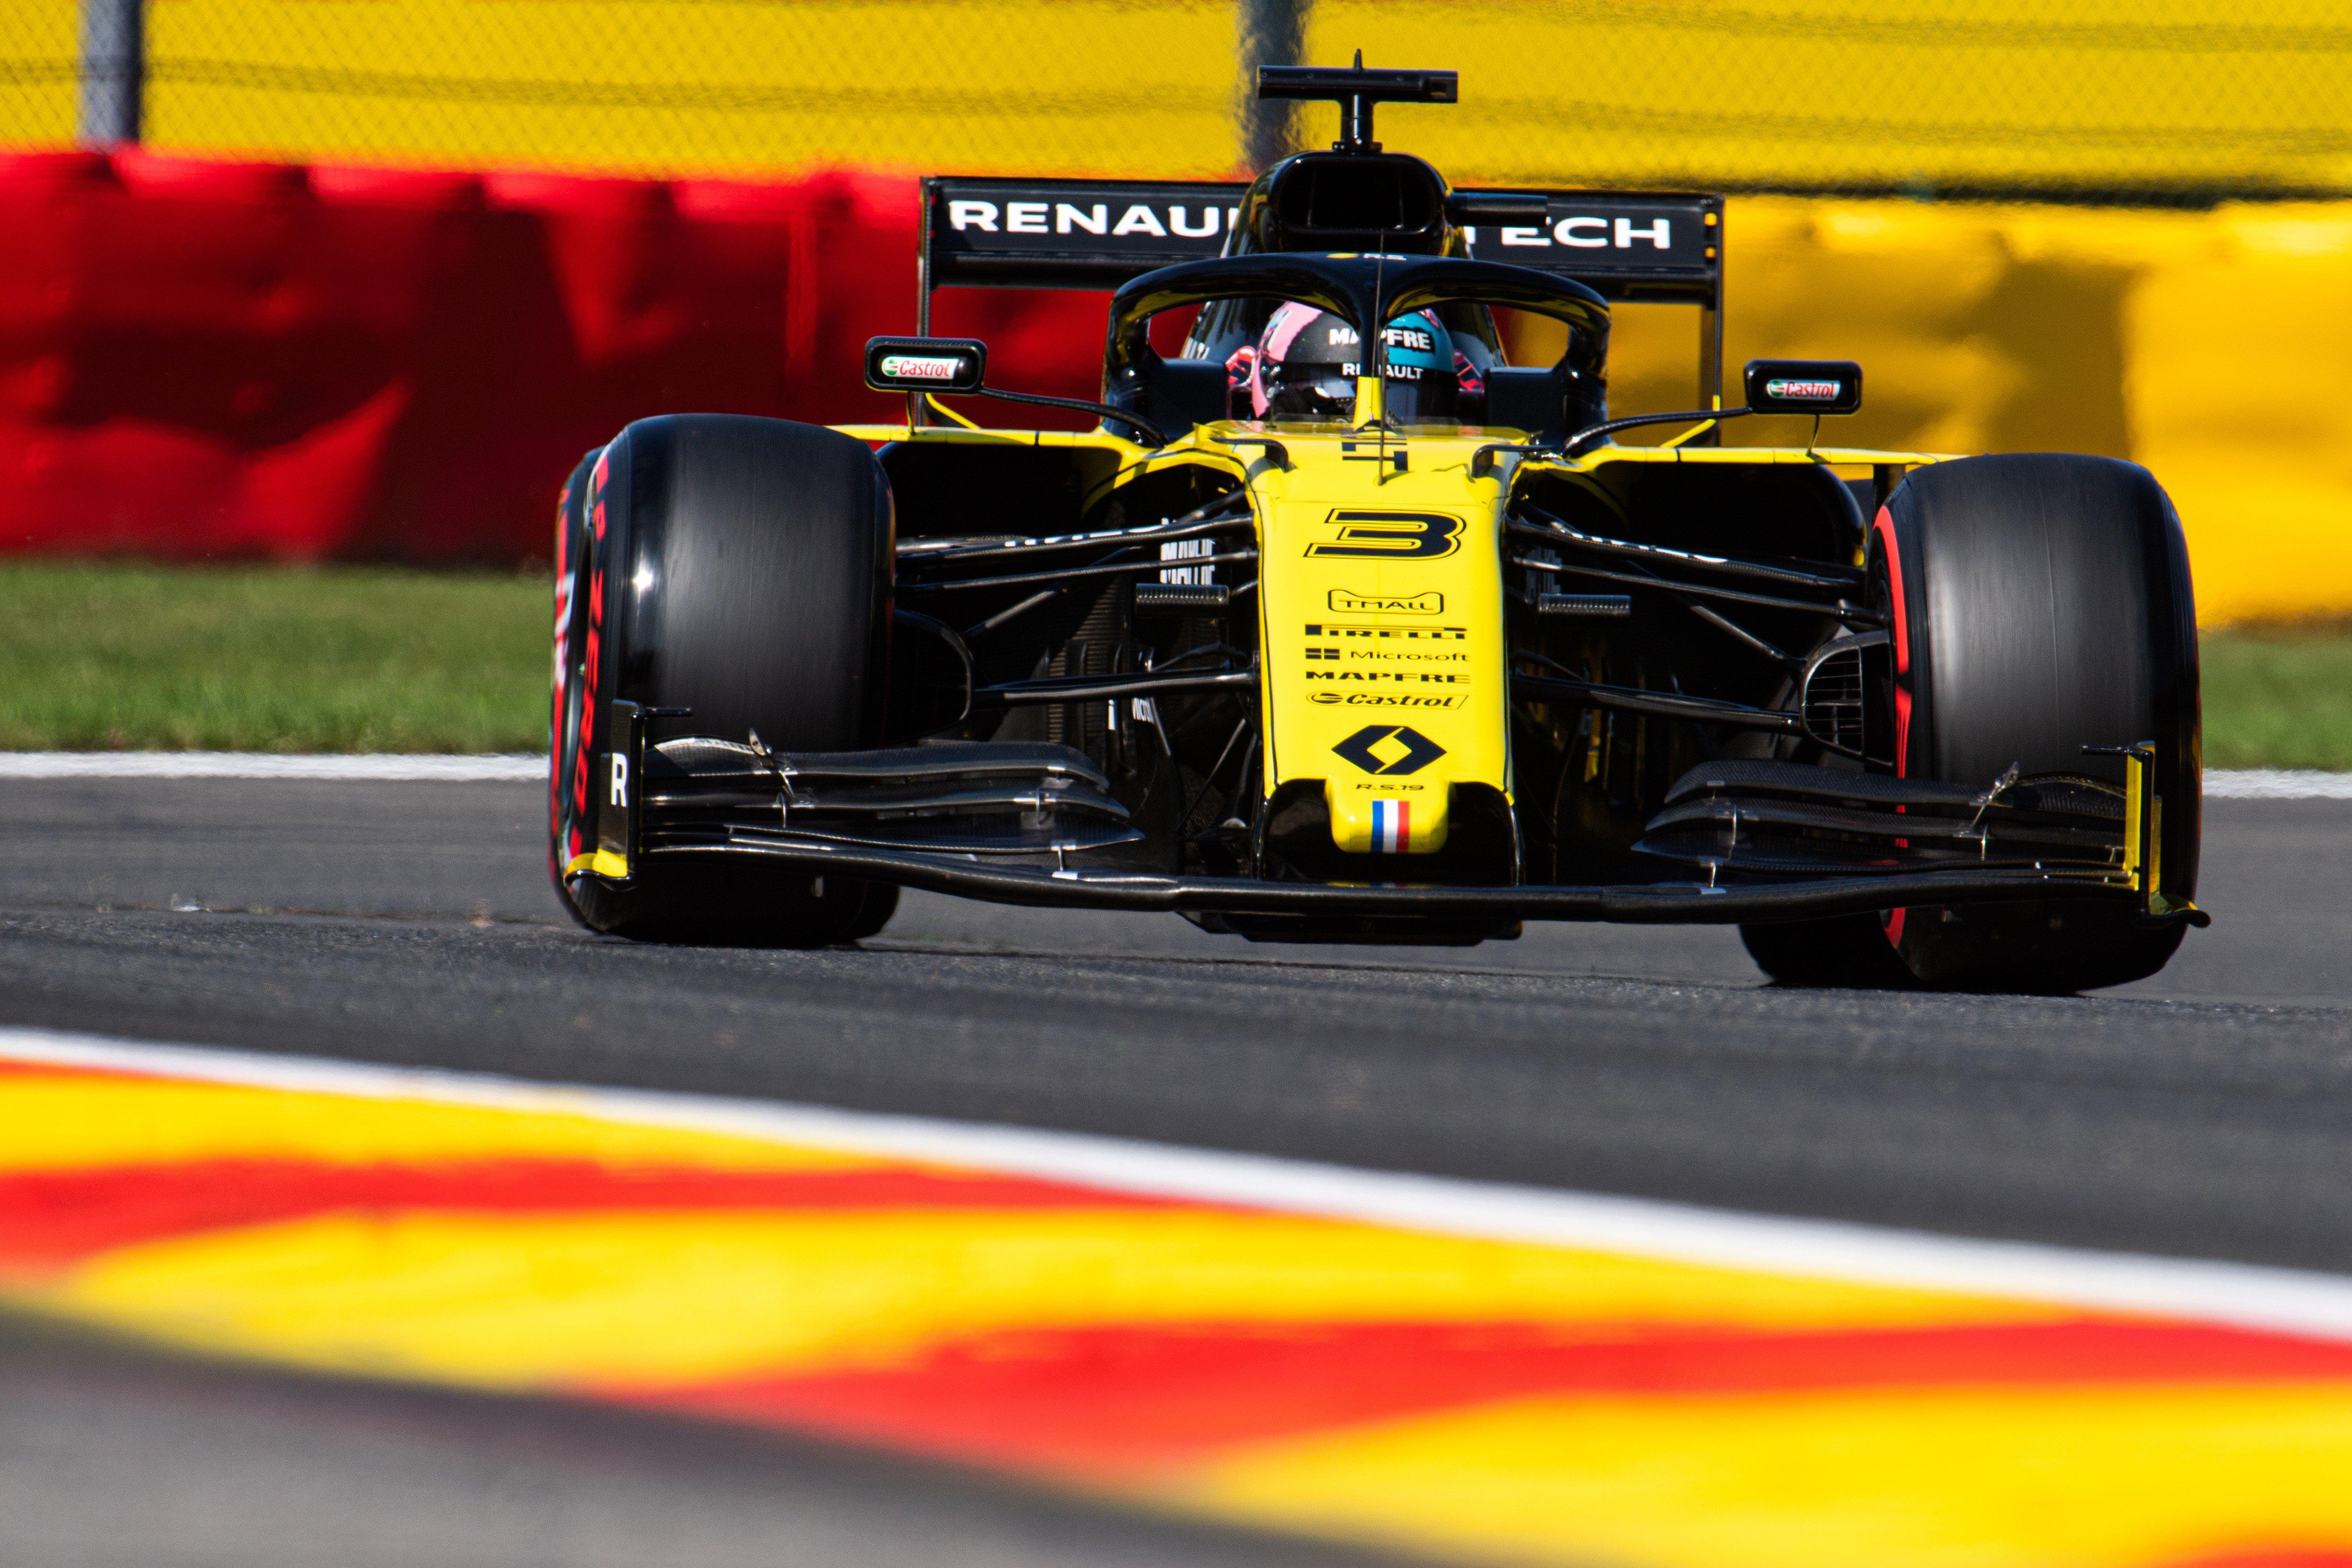 Daniel Ricciardo (AUS) Renault F1 Team RS19. Belgian Grand Prix, Saturday 31st August 2019. Spa-Francorchamps, Belgium.